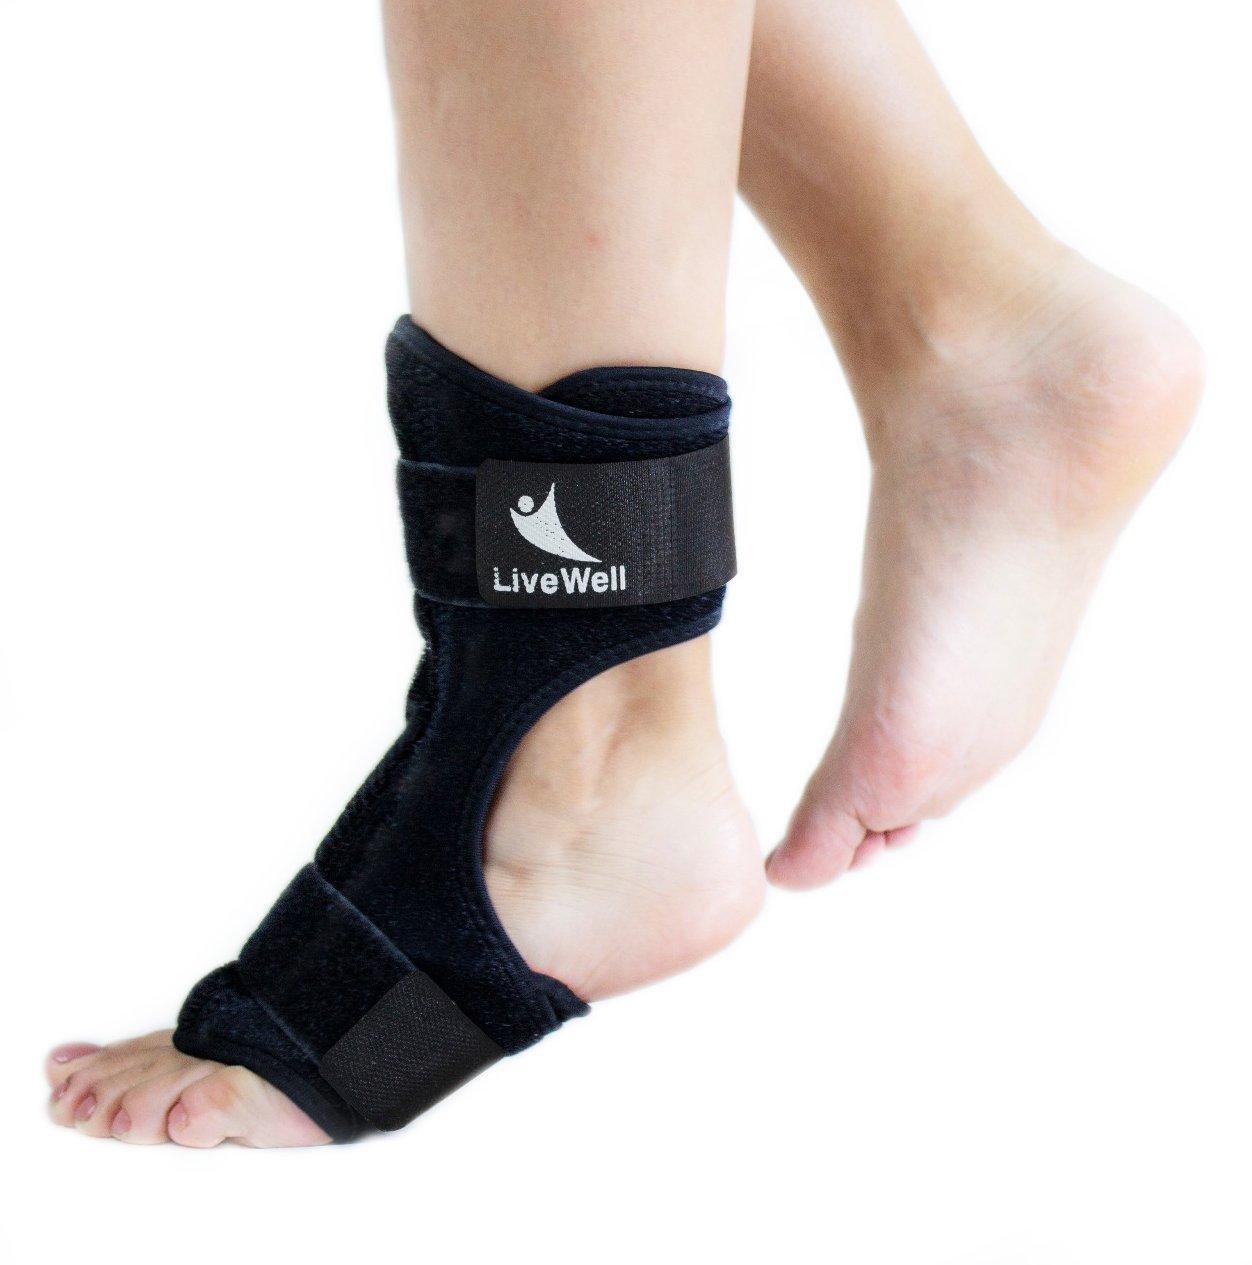 Live Well Plantar Fasciitis Night Split Foot Brace Ankle Brace